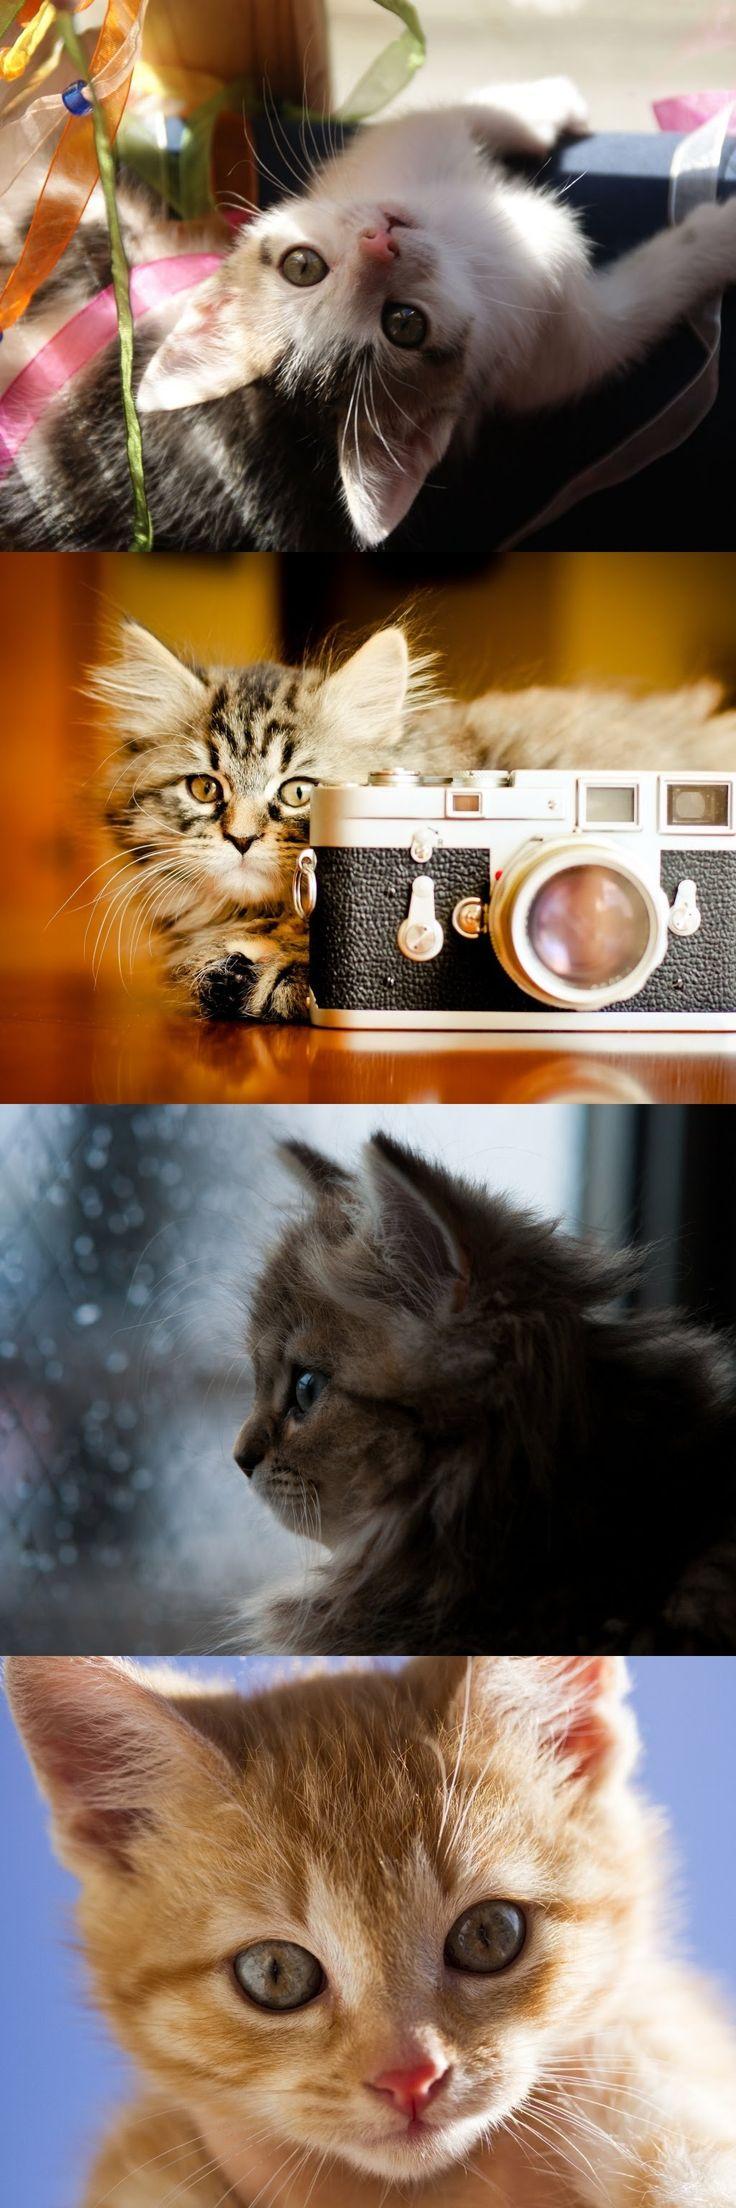 Best 25 Cute kitten videos ideas on Pinterest